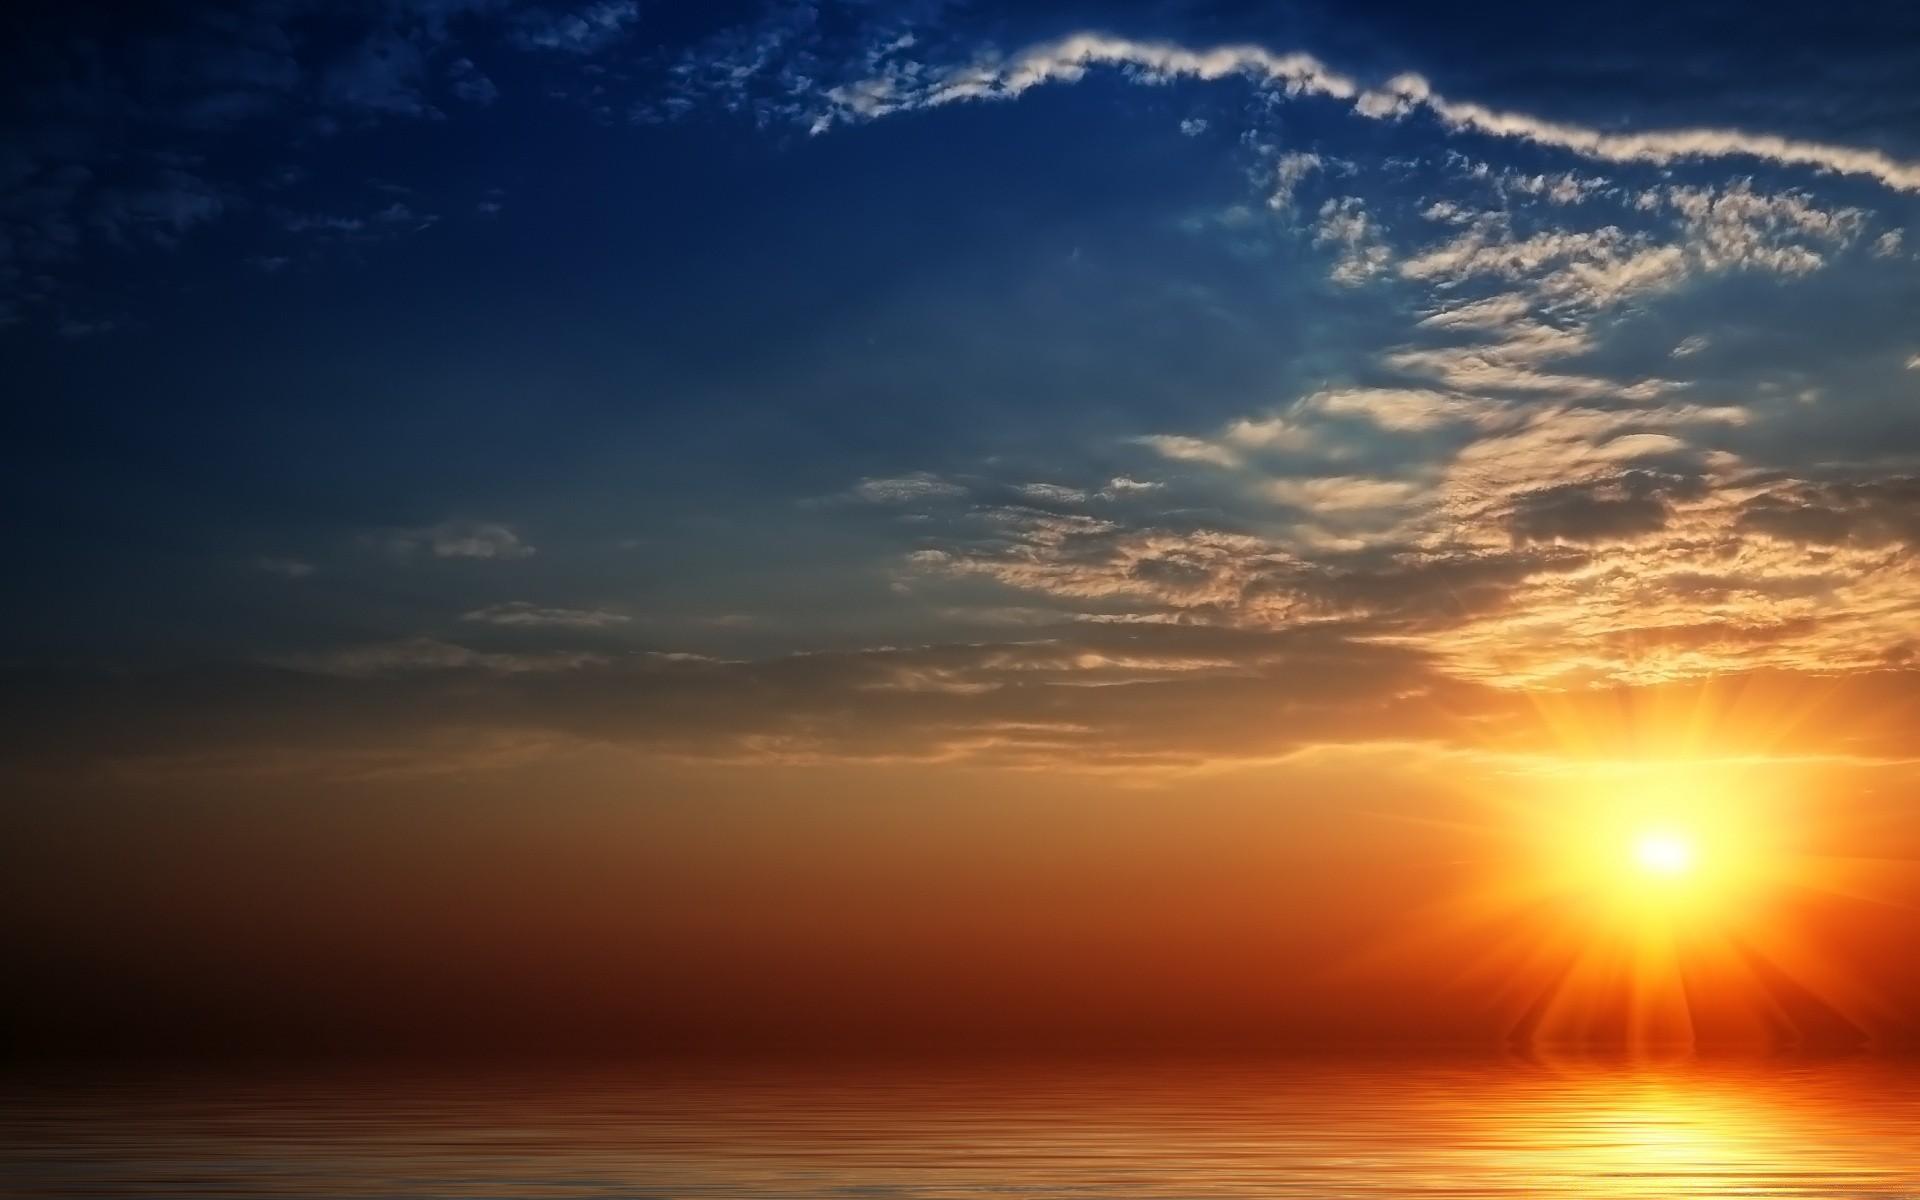 Рассвет небо картинки